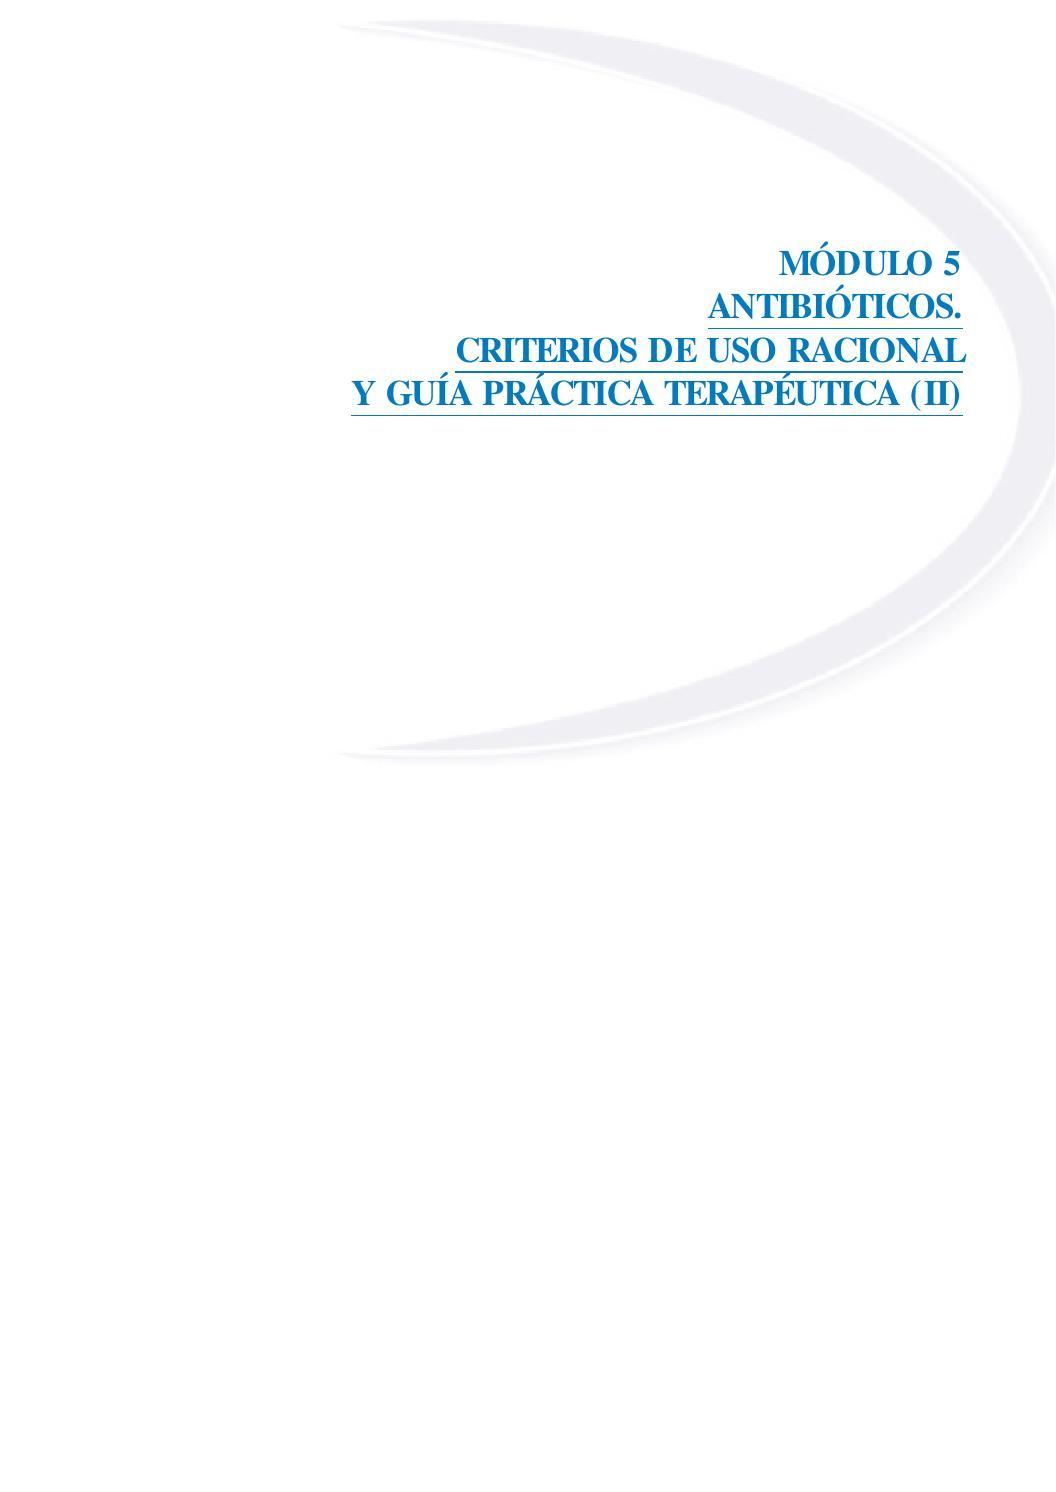 amoxicilina y prostatitis con ácido clavulánico